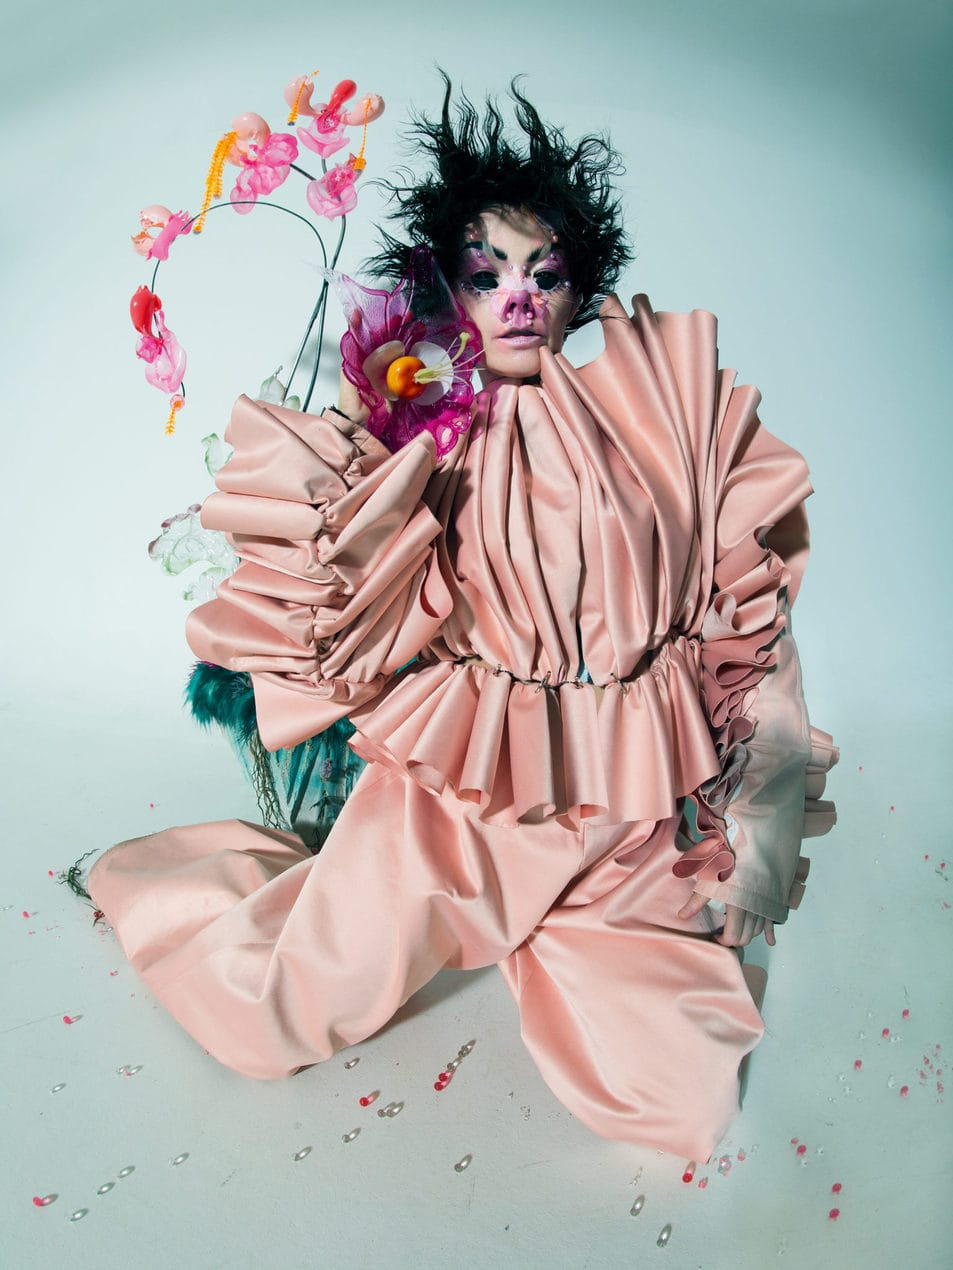 Björk Marlou Breuls. Reykjavik 2017